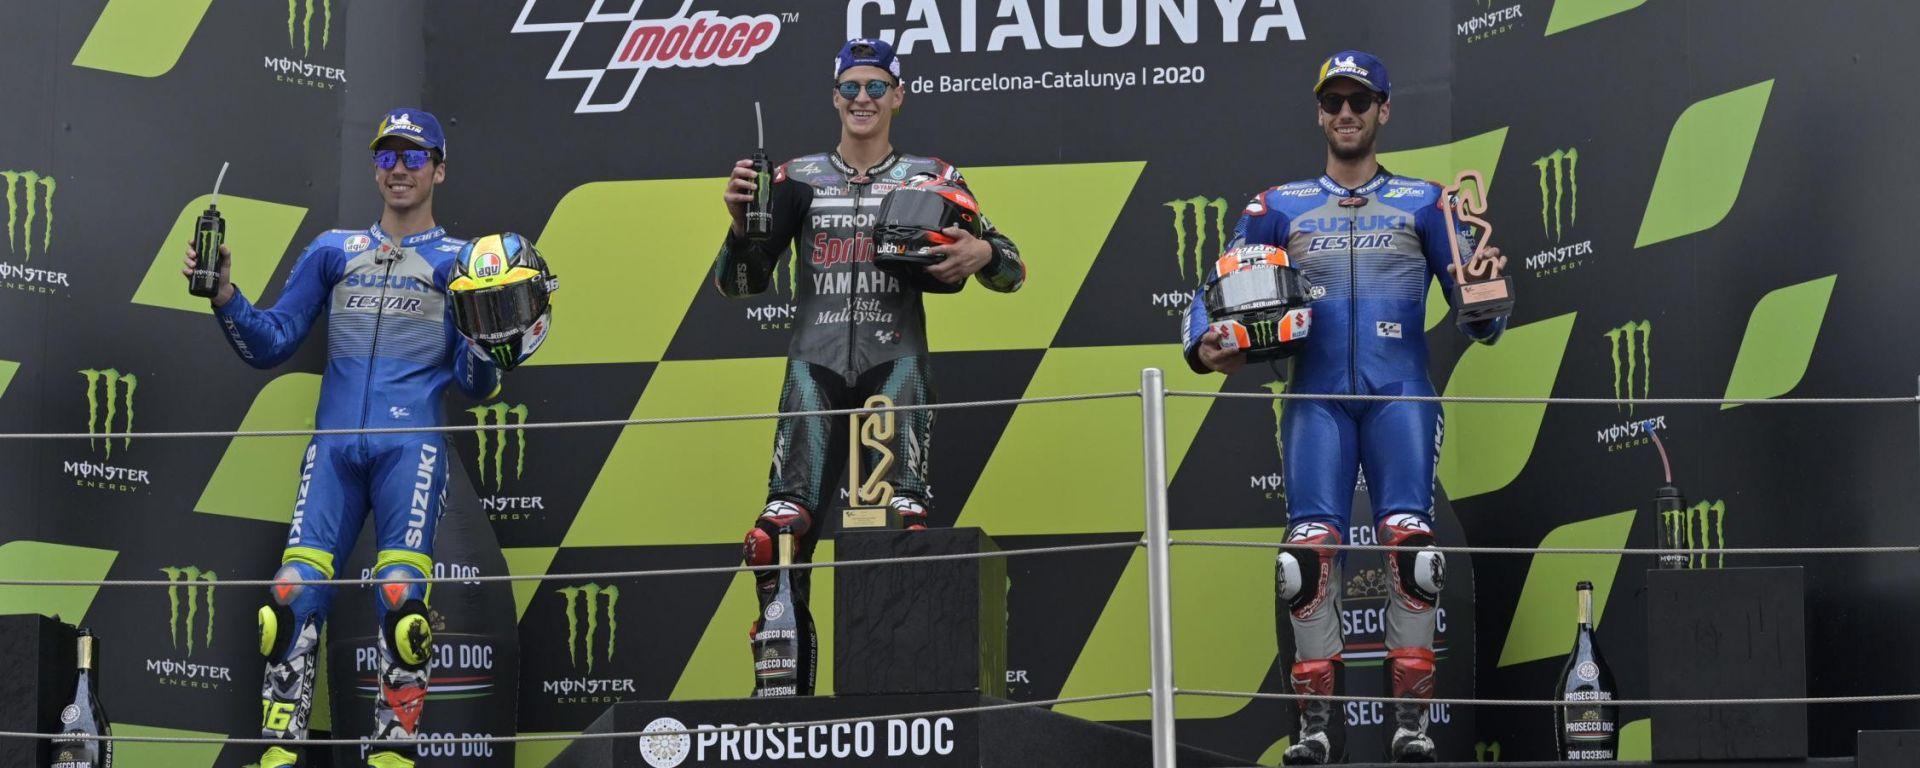 Fabio Quartararo (Yamaha) tra i due piloti Suzuki Joan Mir e Alex Rins